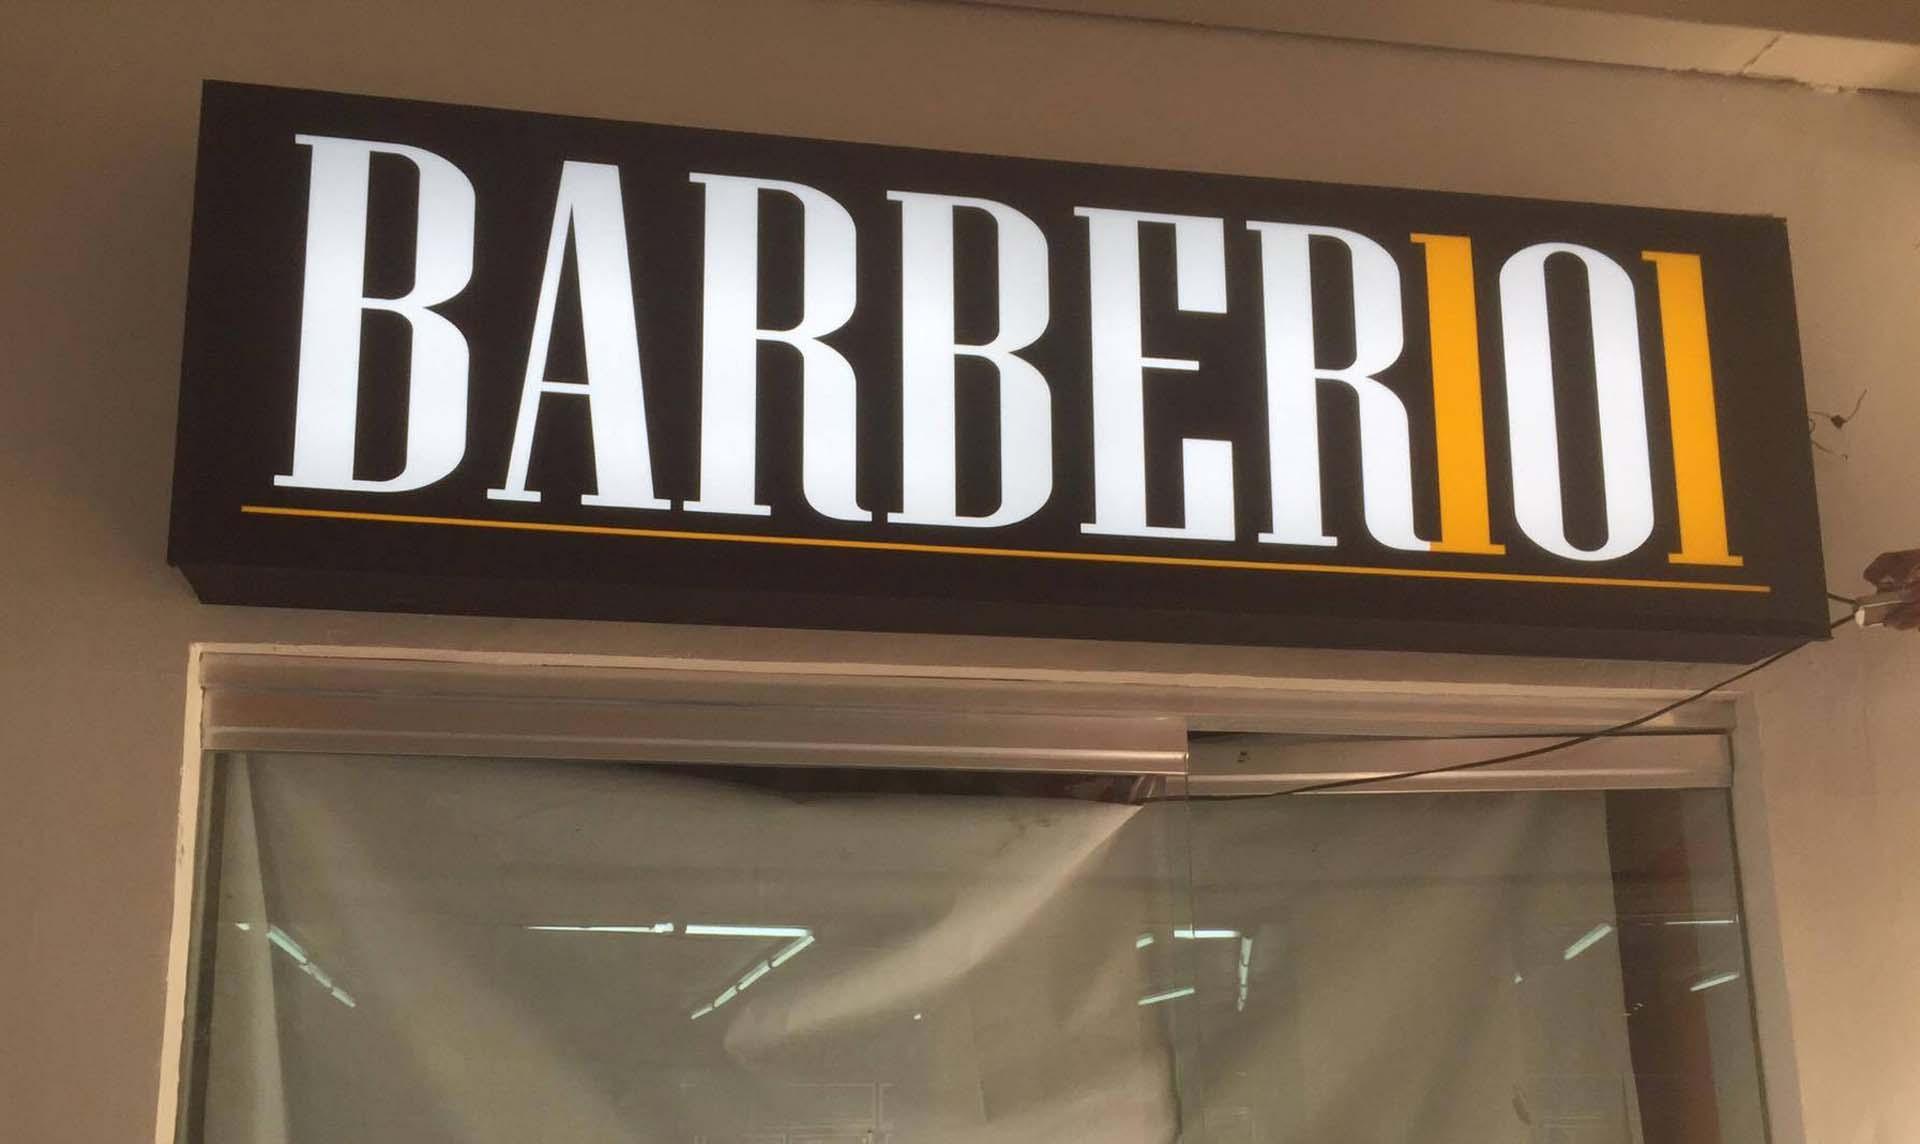 Barbero 101.jpg